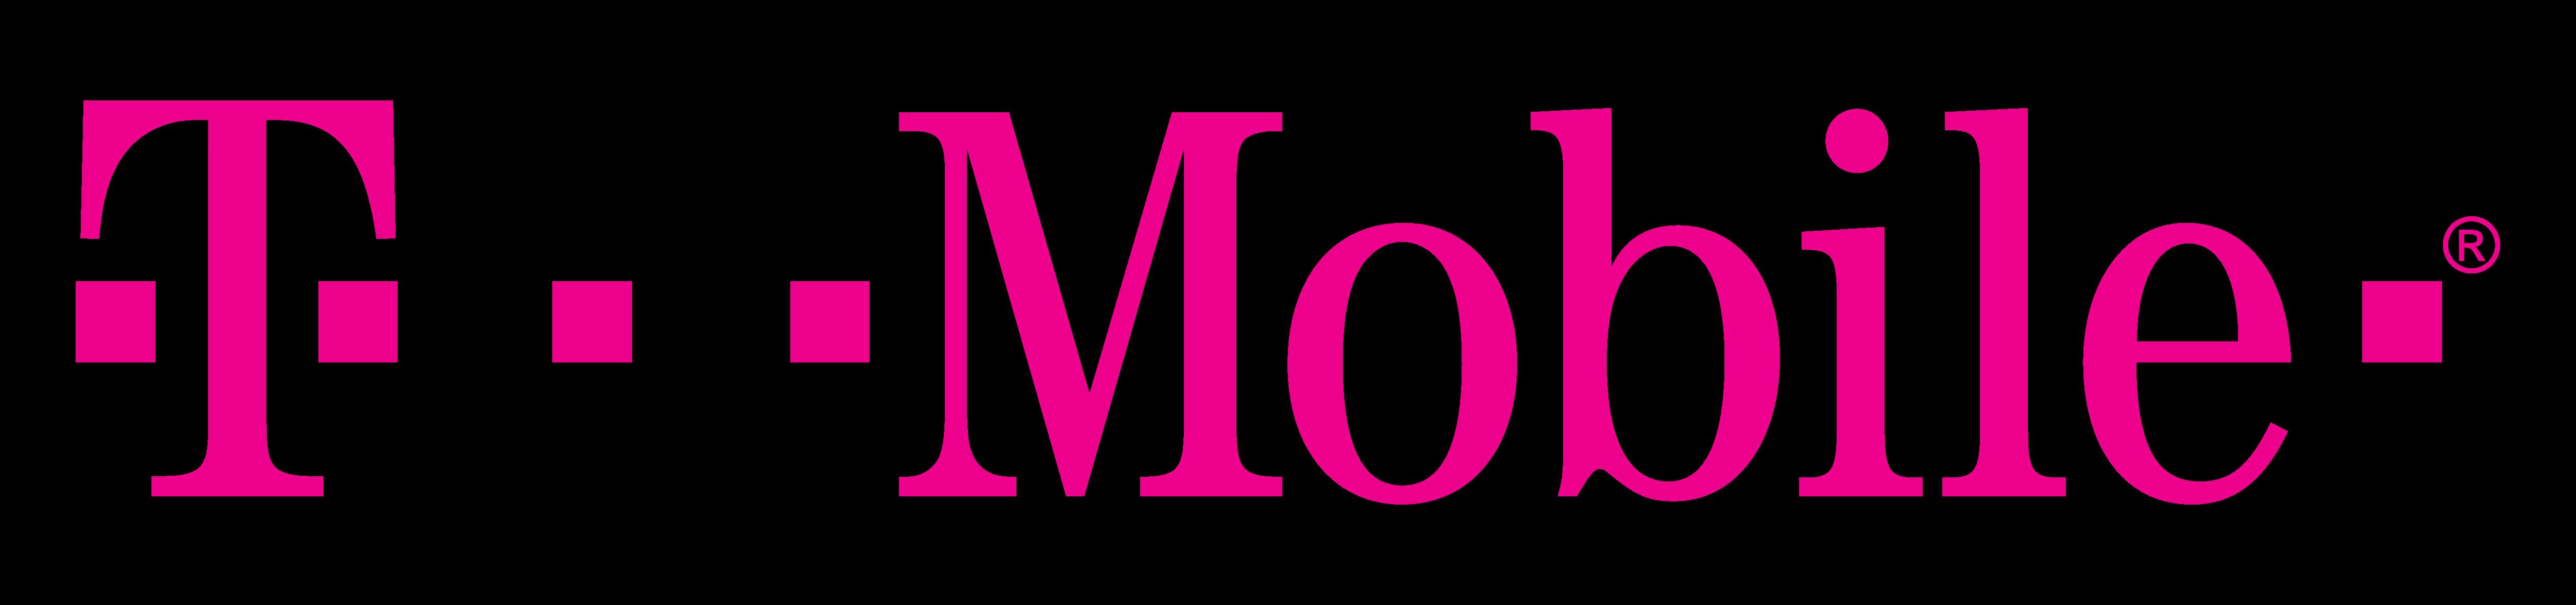 T Mobile Un Carrier (Kick back i.e bill credit 10$ per line for < 2GB data use) + All inclusive 160$ for 4 lines on T Mobile One (with bill credit 120 all inclusive)